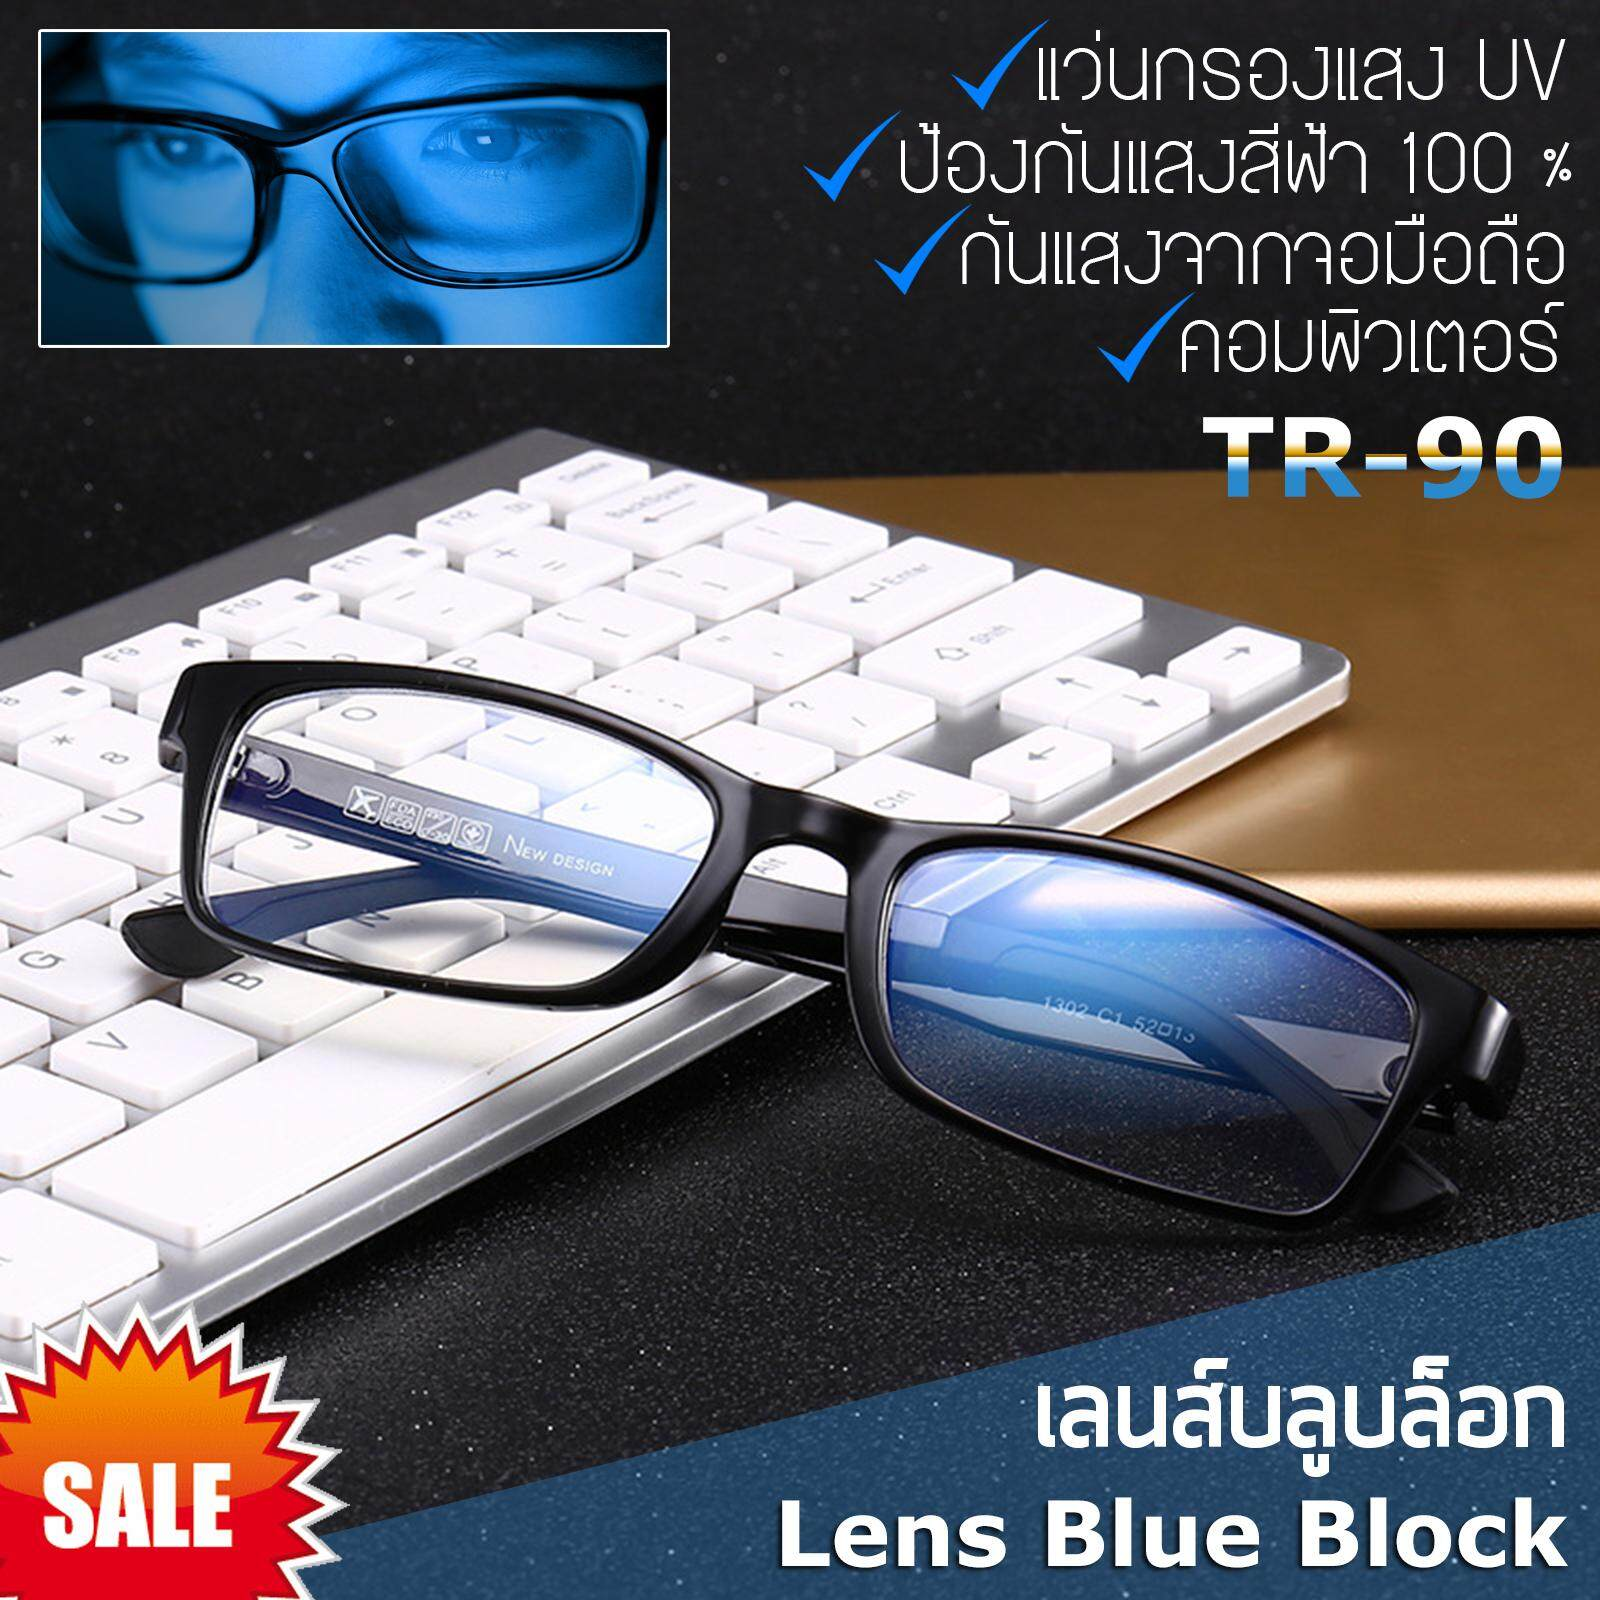 Blue Light กรองแสงคอมพิวเตอร์ มือถือ ป้องกันแสงสีฟ้า 100% แว่นตา เลนส์บลู รุ่น 1302 สไตล์เกาหลี กรอบแว่นตา กรอบเต็ม ขาข้อต่อ วัสดุ Tr90 ทีอาร์-90 น้ำหนักเบา ทนทาน Full Frame Eyeglass Material Filter Blue Block Fashion Korea Eyewear Top Glasses.